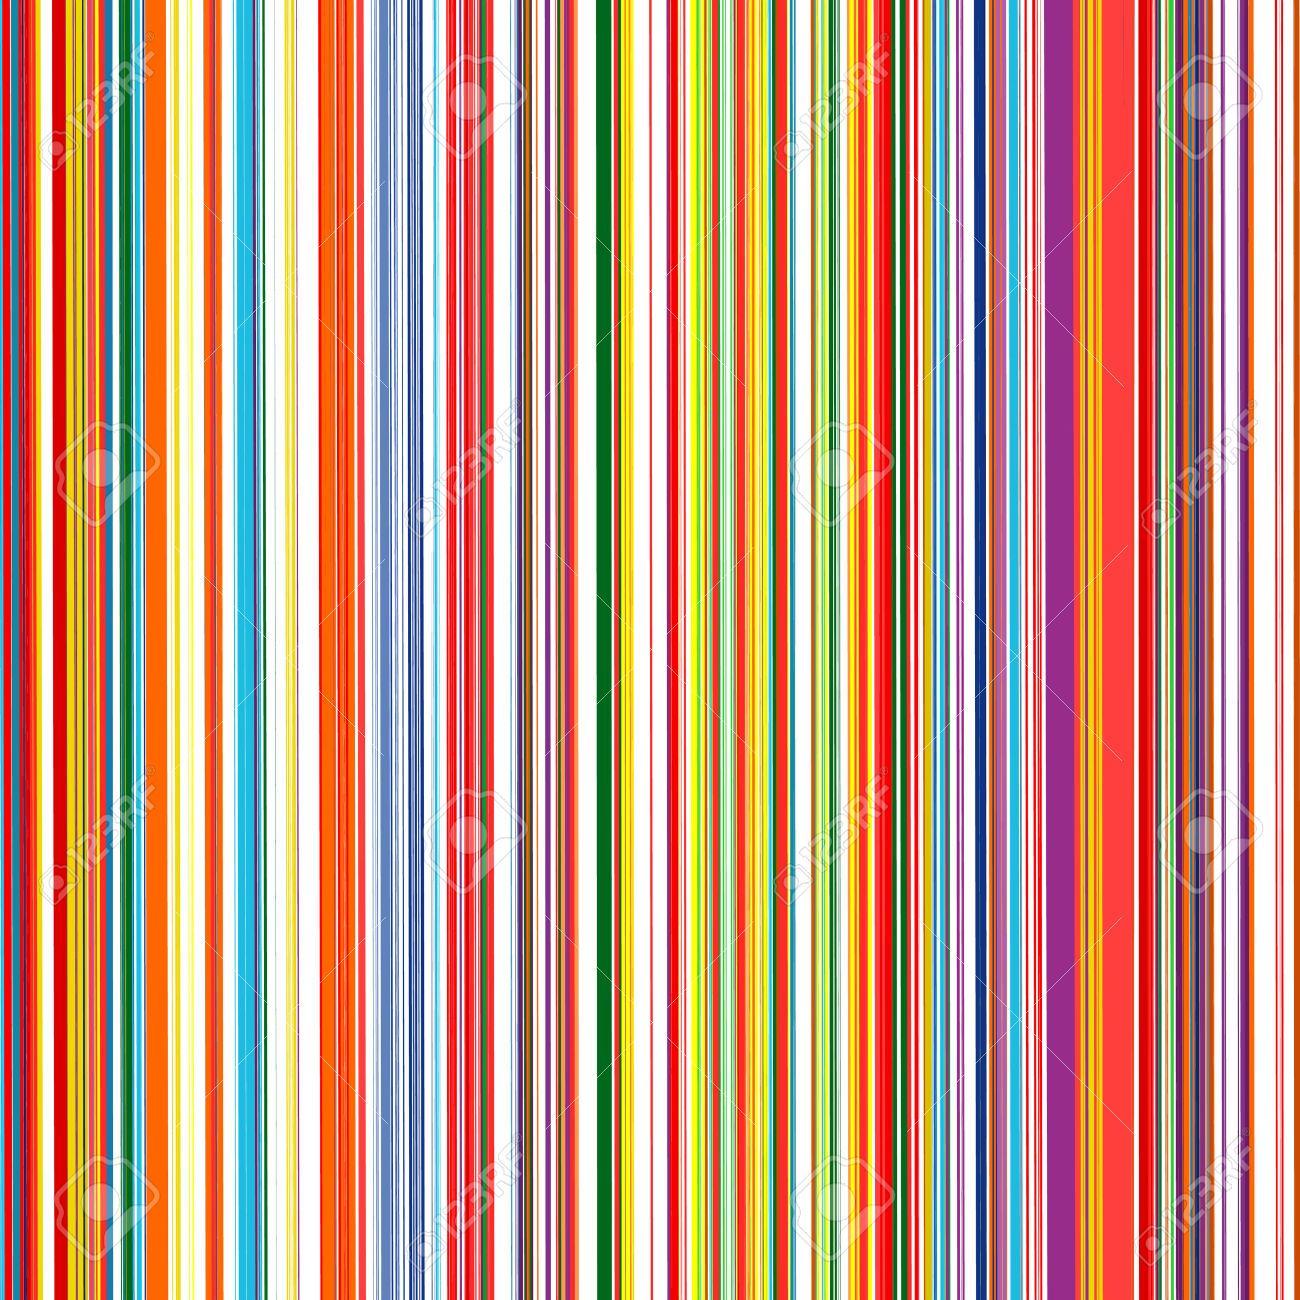 Pin by ASLI BARAN on SPAULDING CAMBRIDGE HDR Color